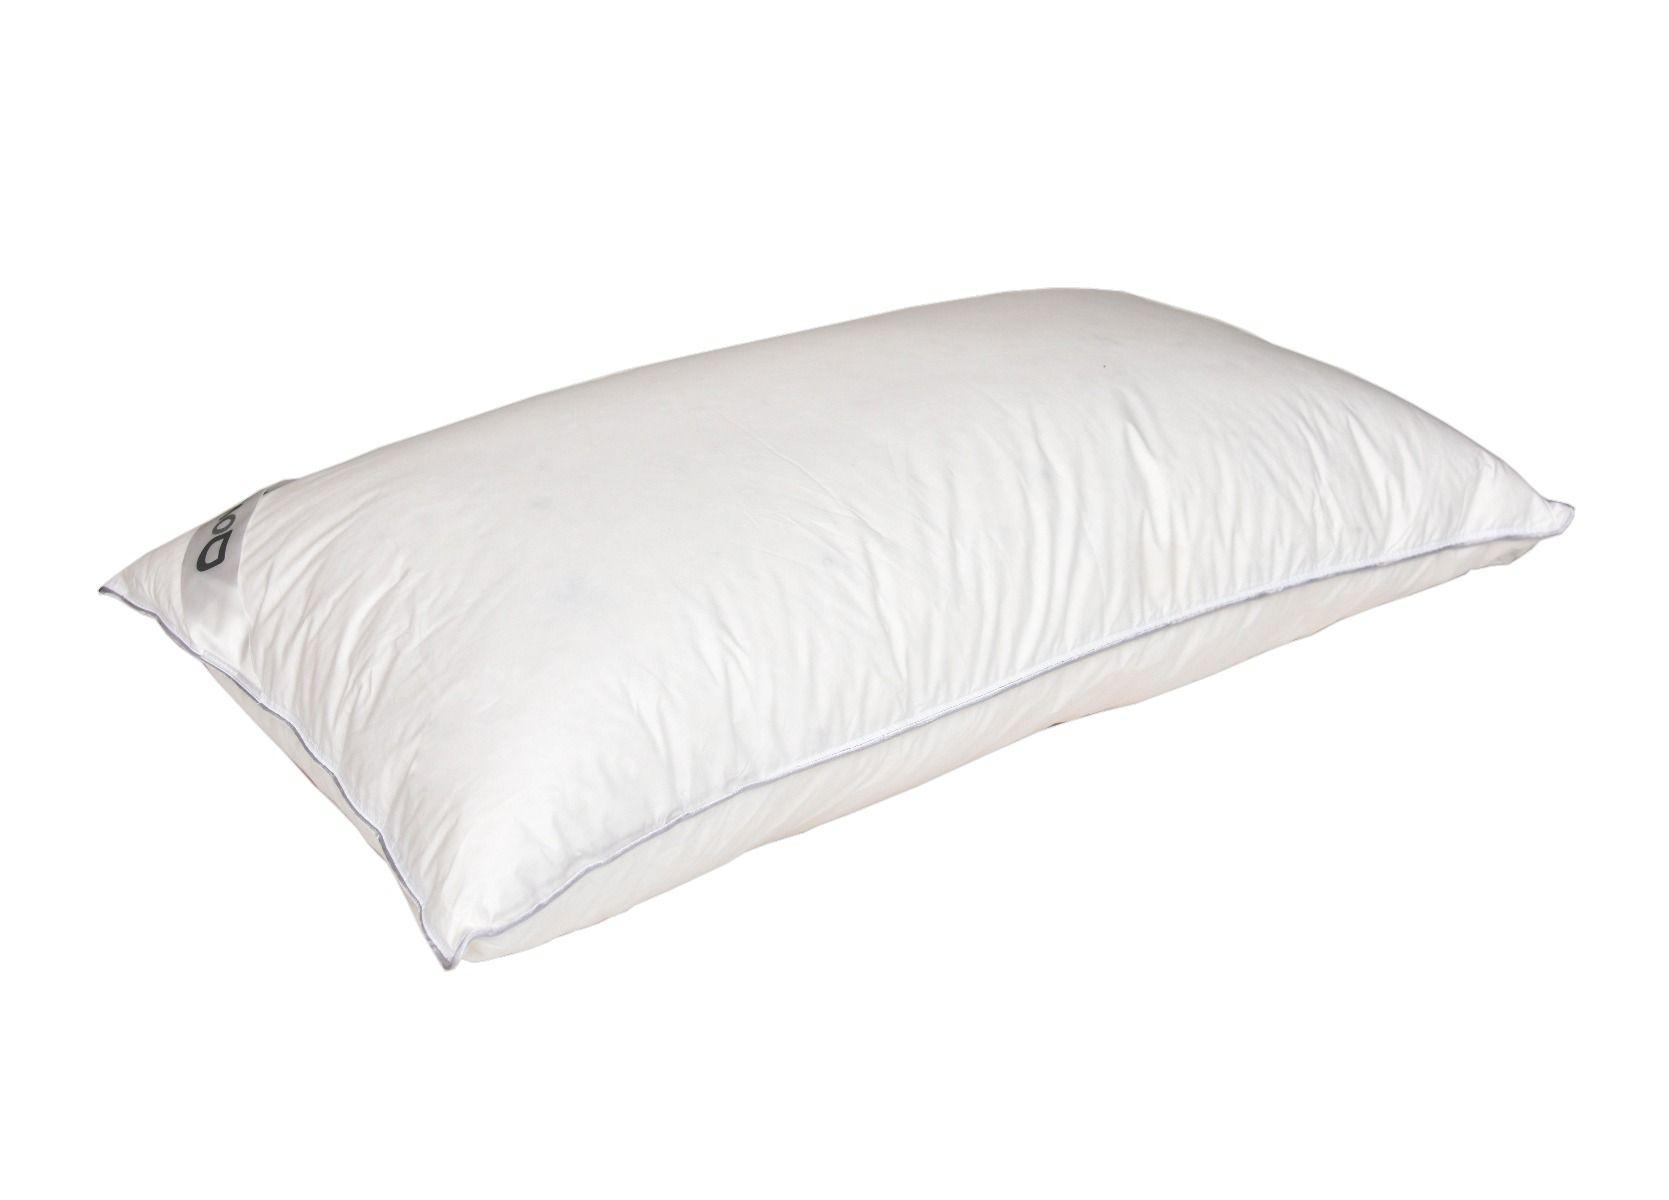 soft white goose down pillow